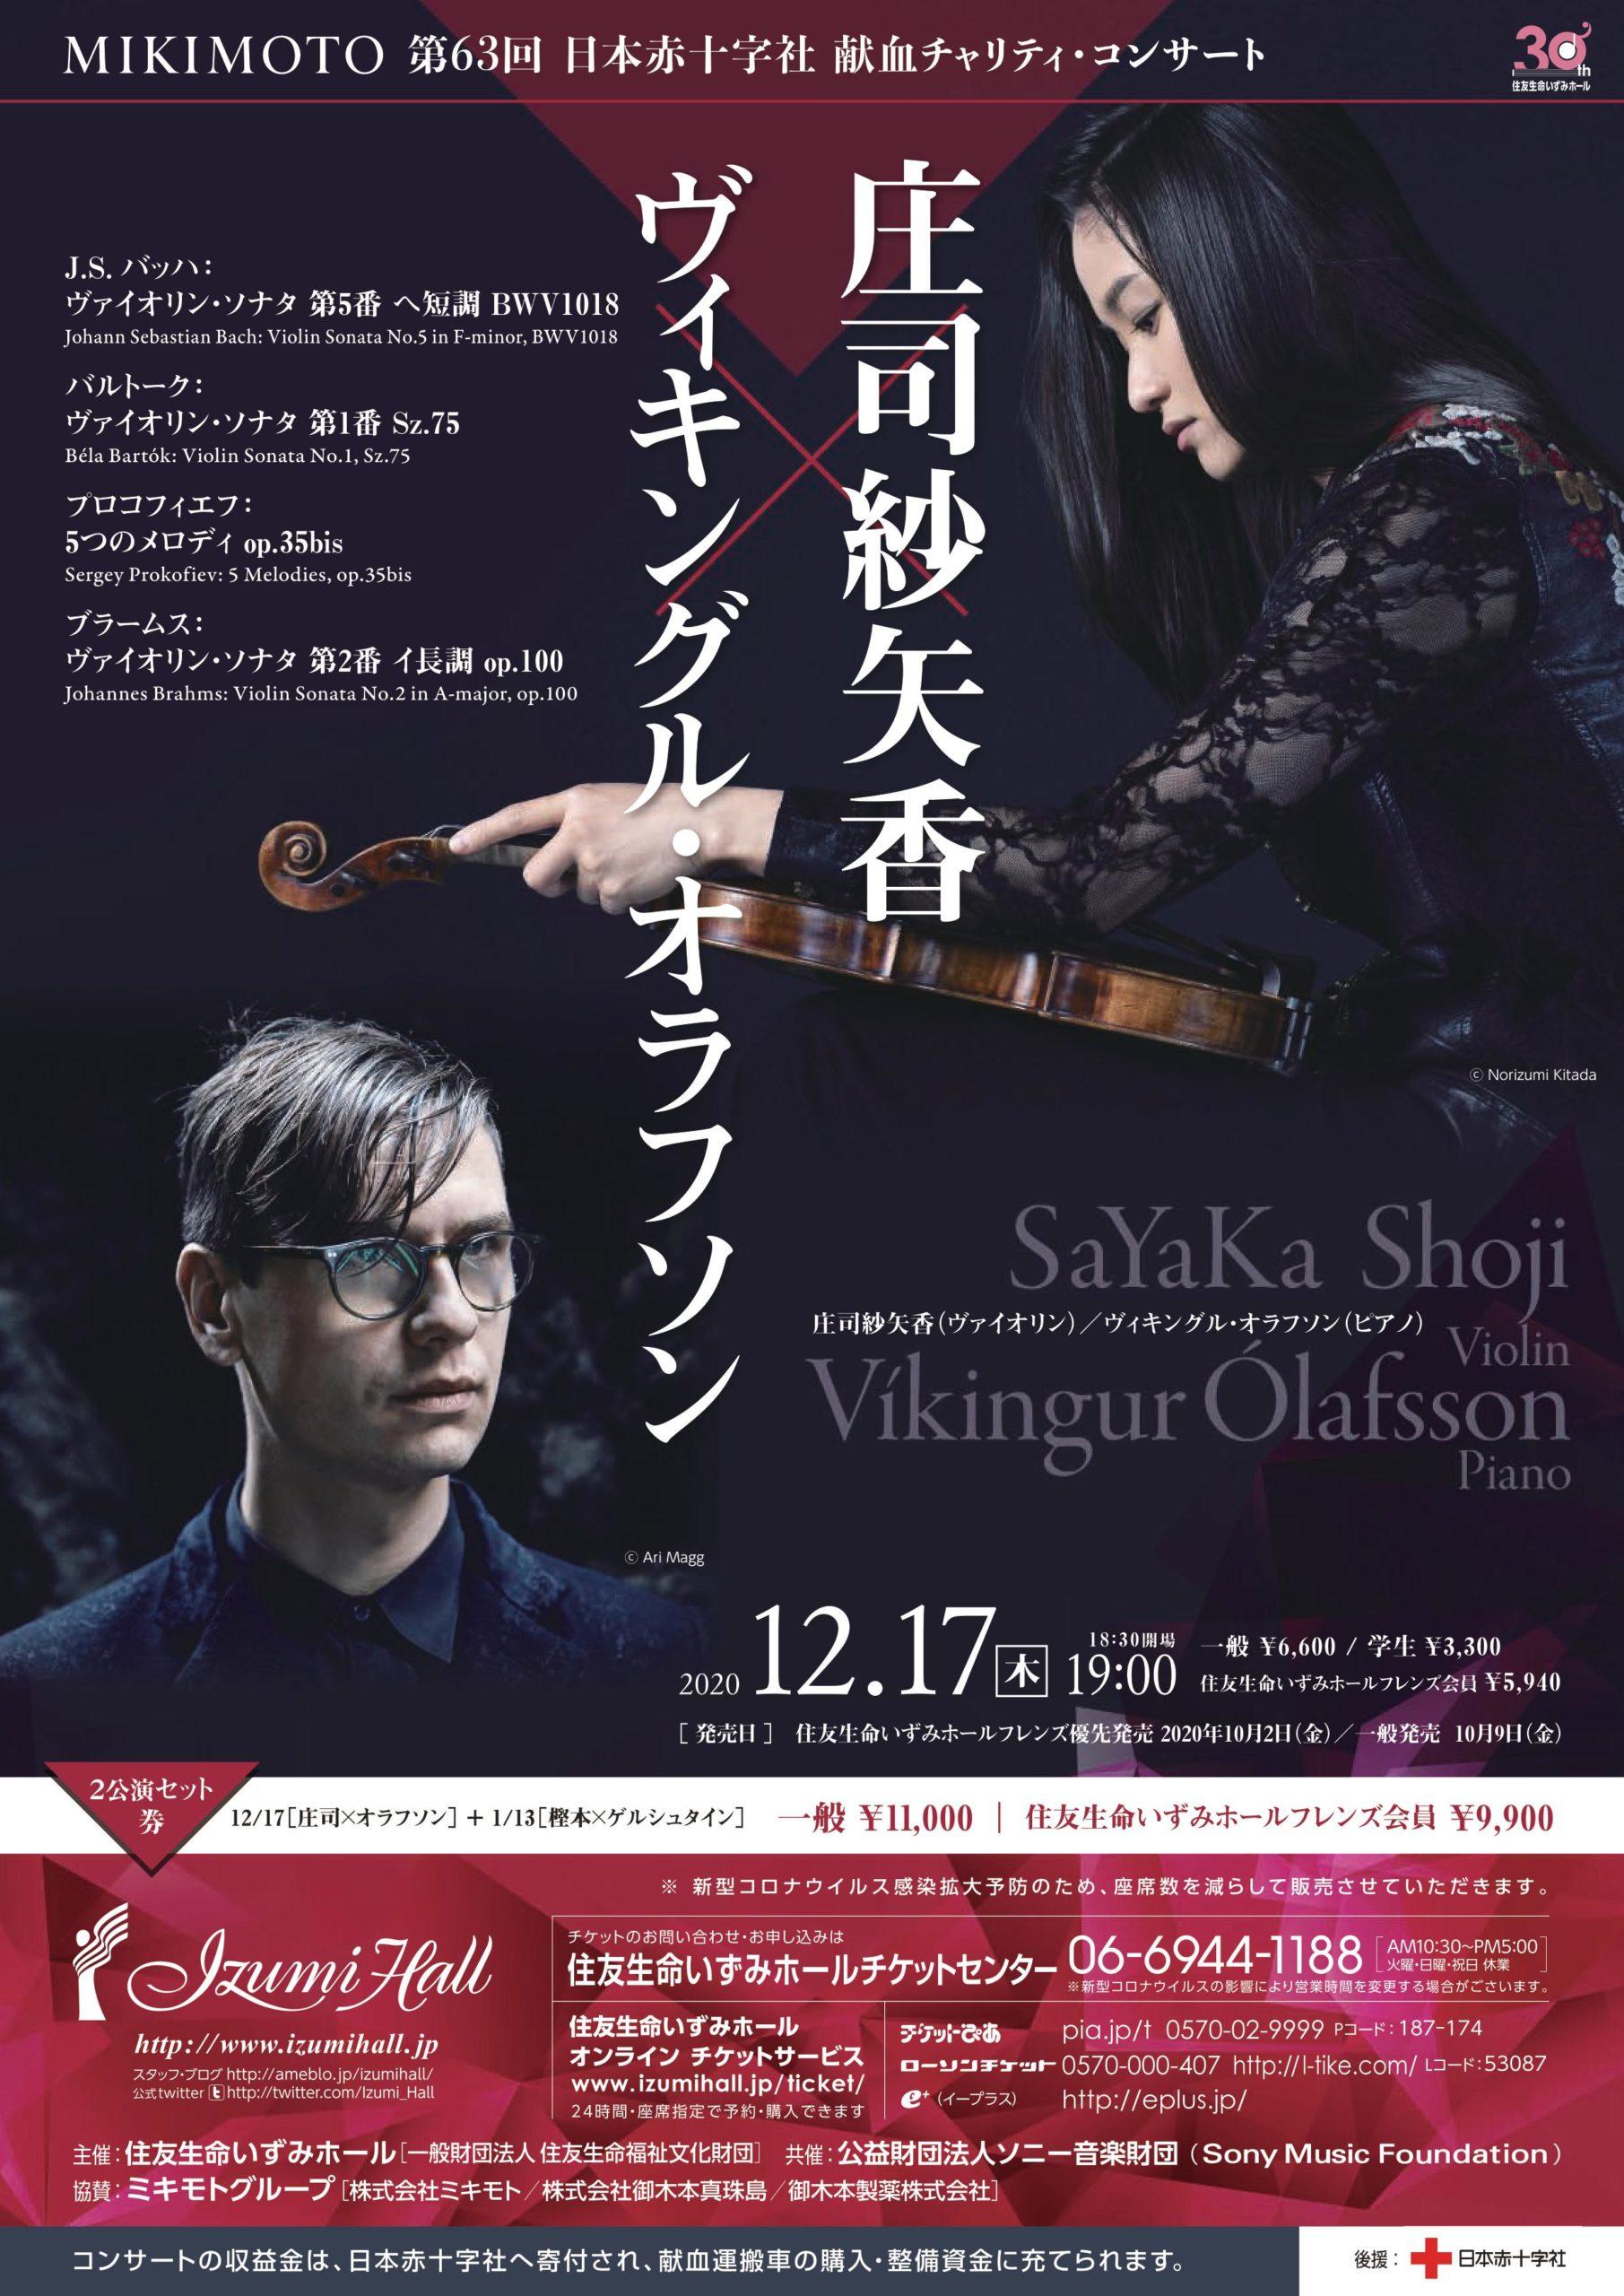 MIKIMOTO 第63回 日本赤十字社 献血チャリティ・コンサート 庄司紗矢香&ヴィキングル・オラフソン